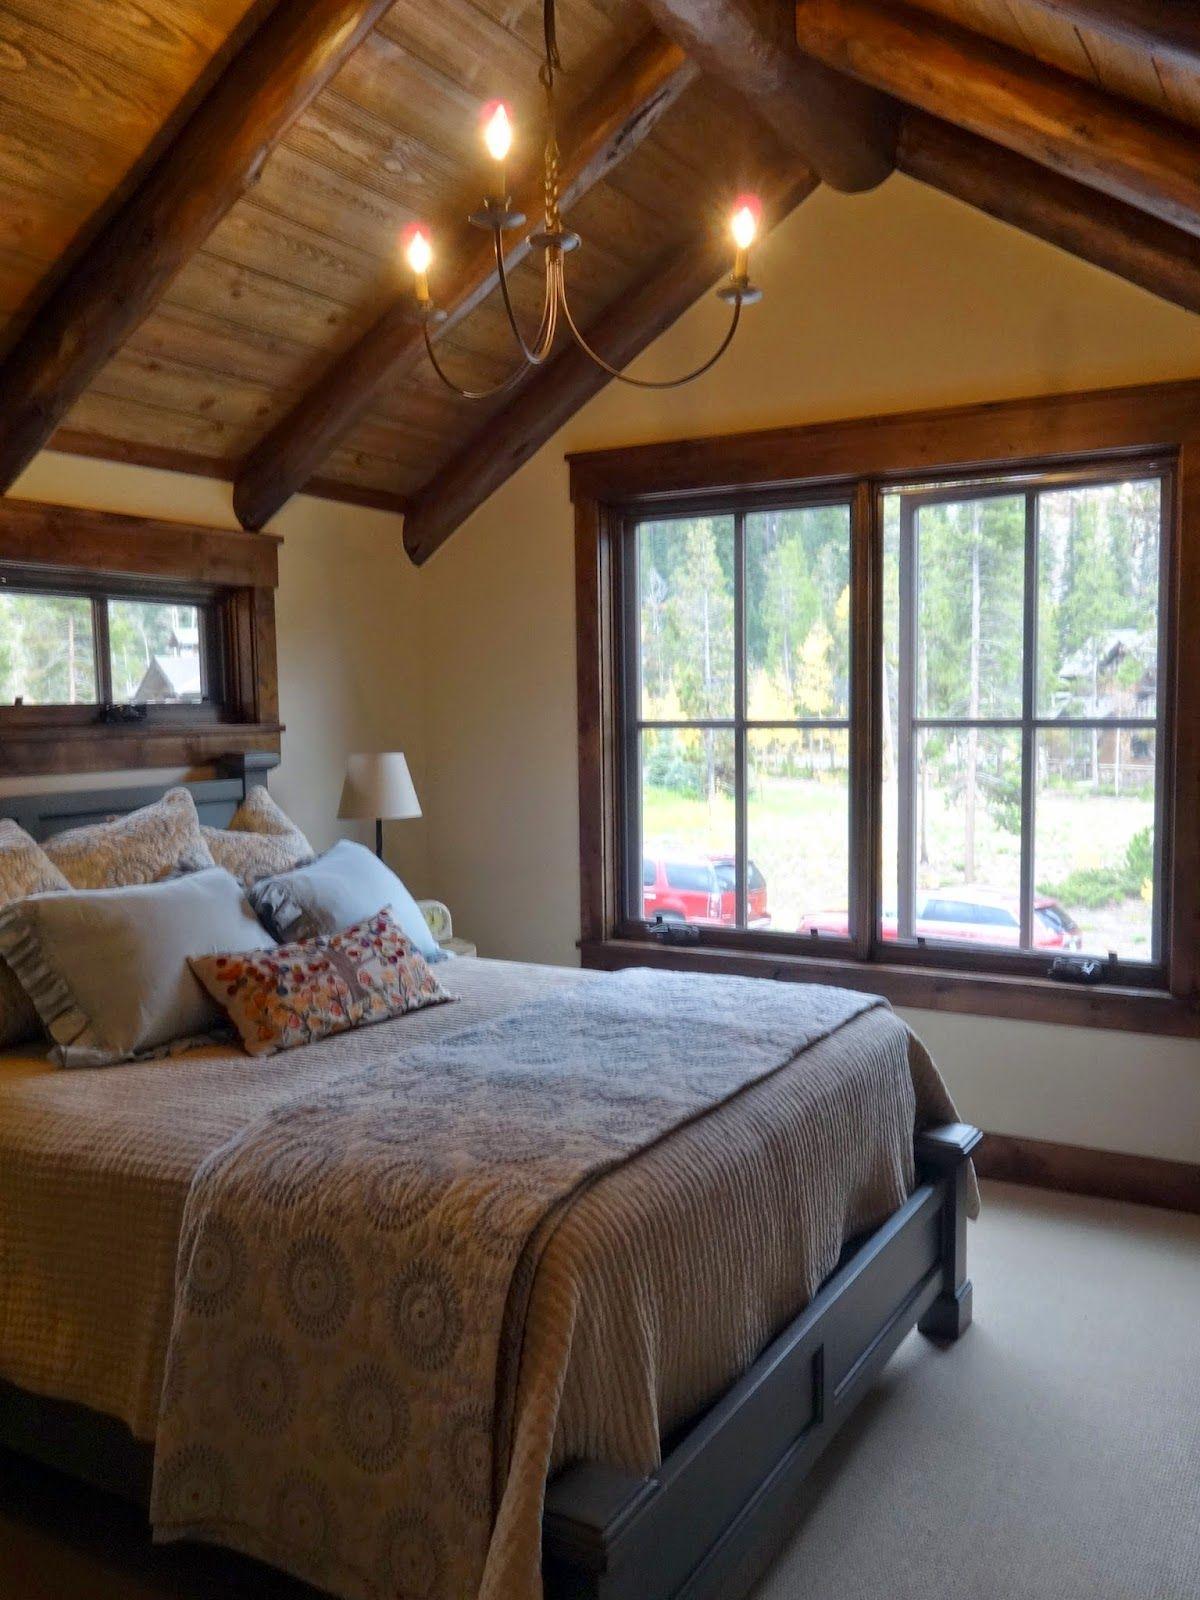 10 Decorating Ideas For Your Cozy Mountain Home Decoracao De